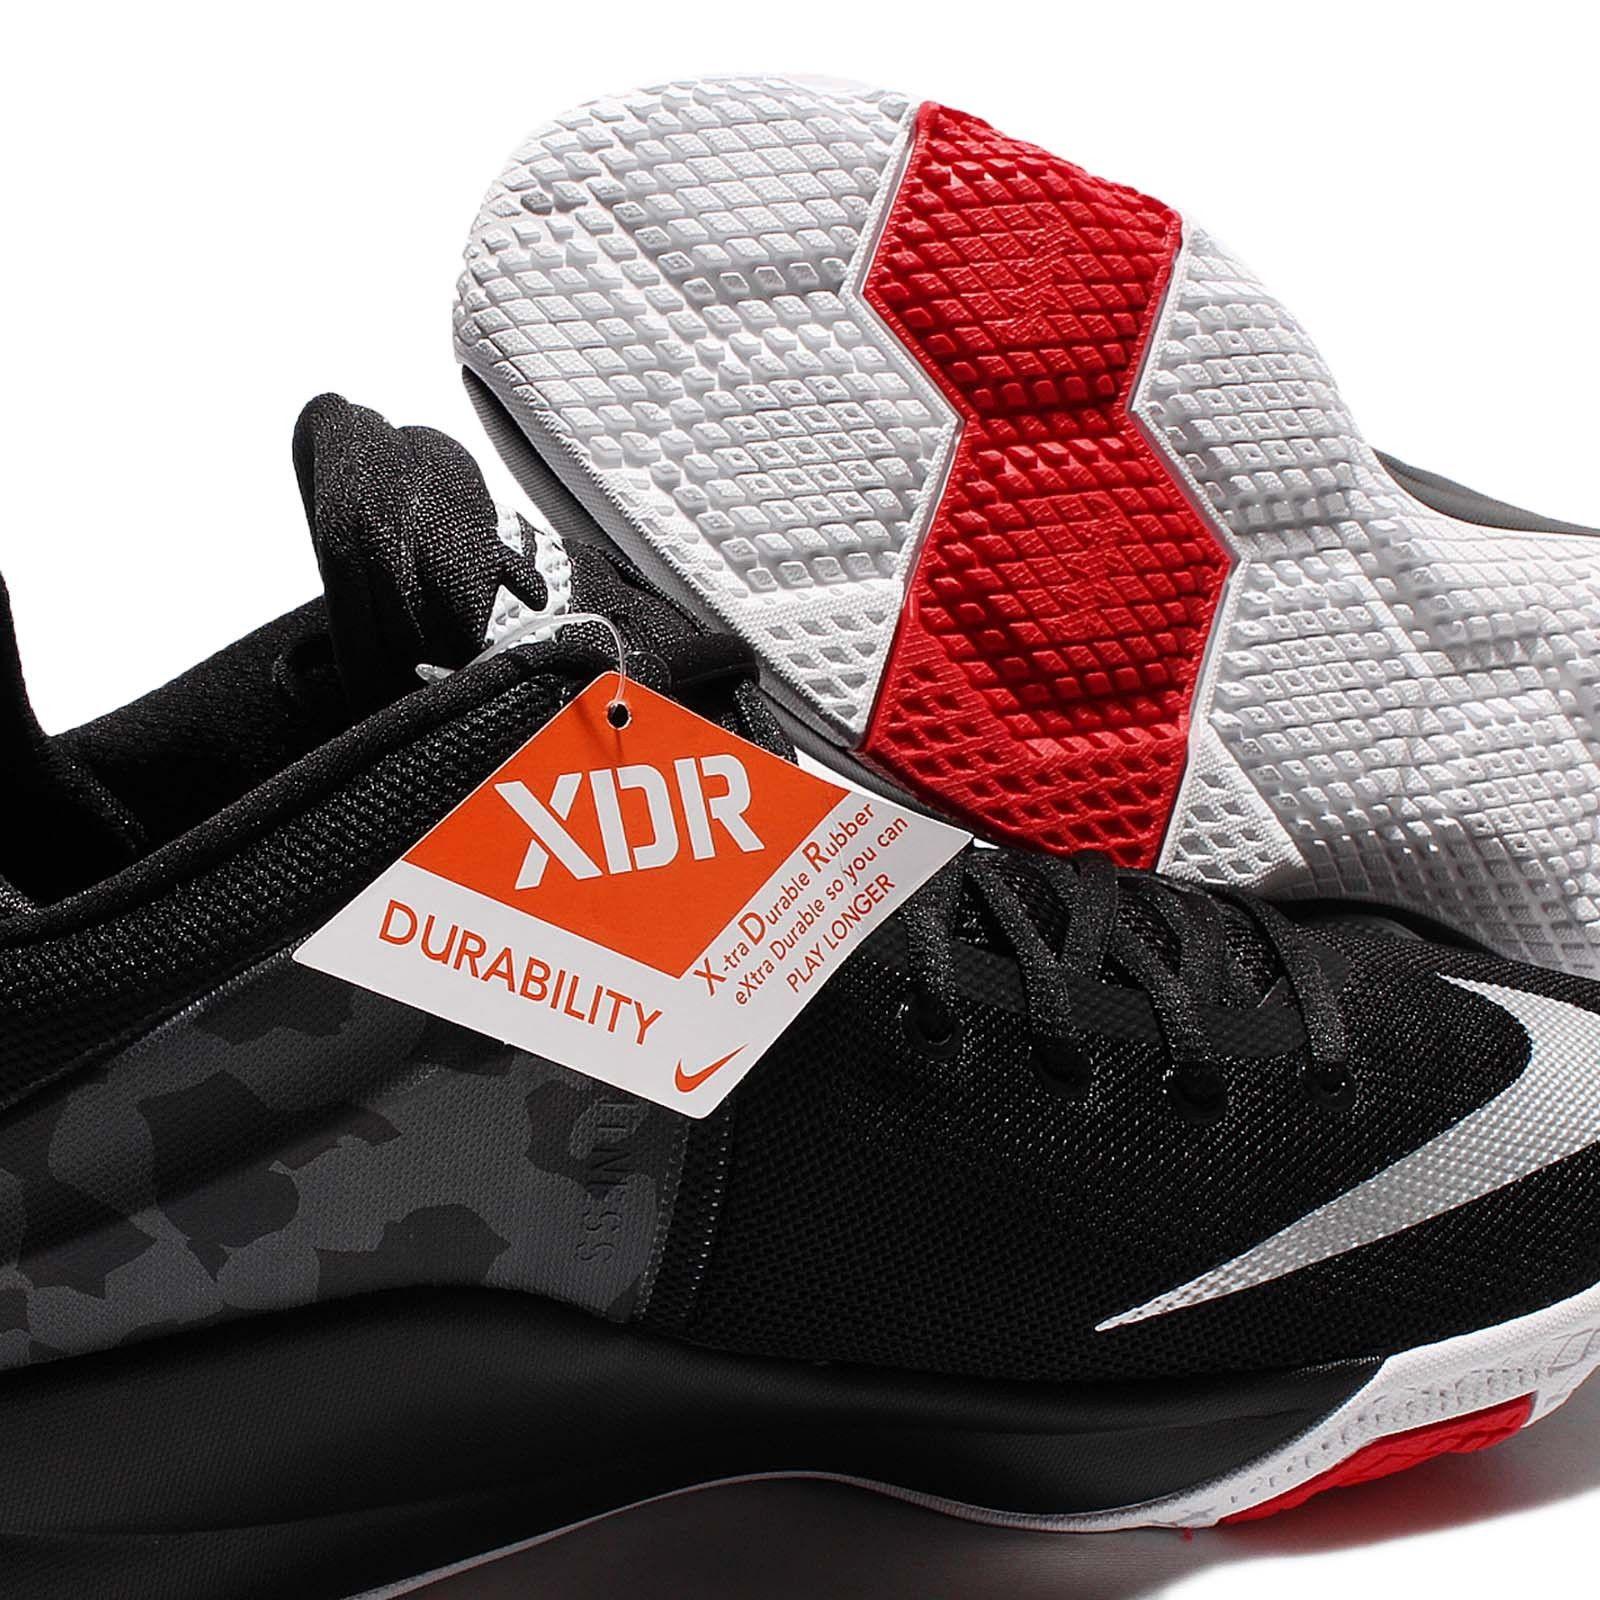 xdr nike basketball shoes